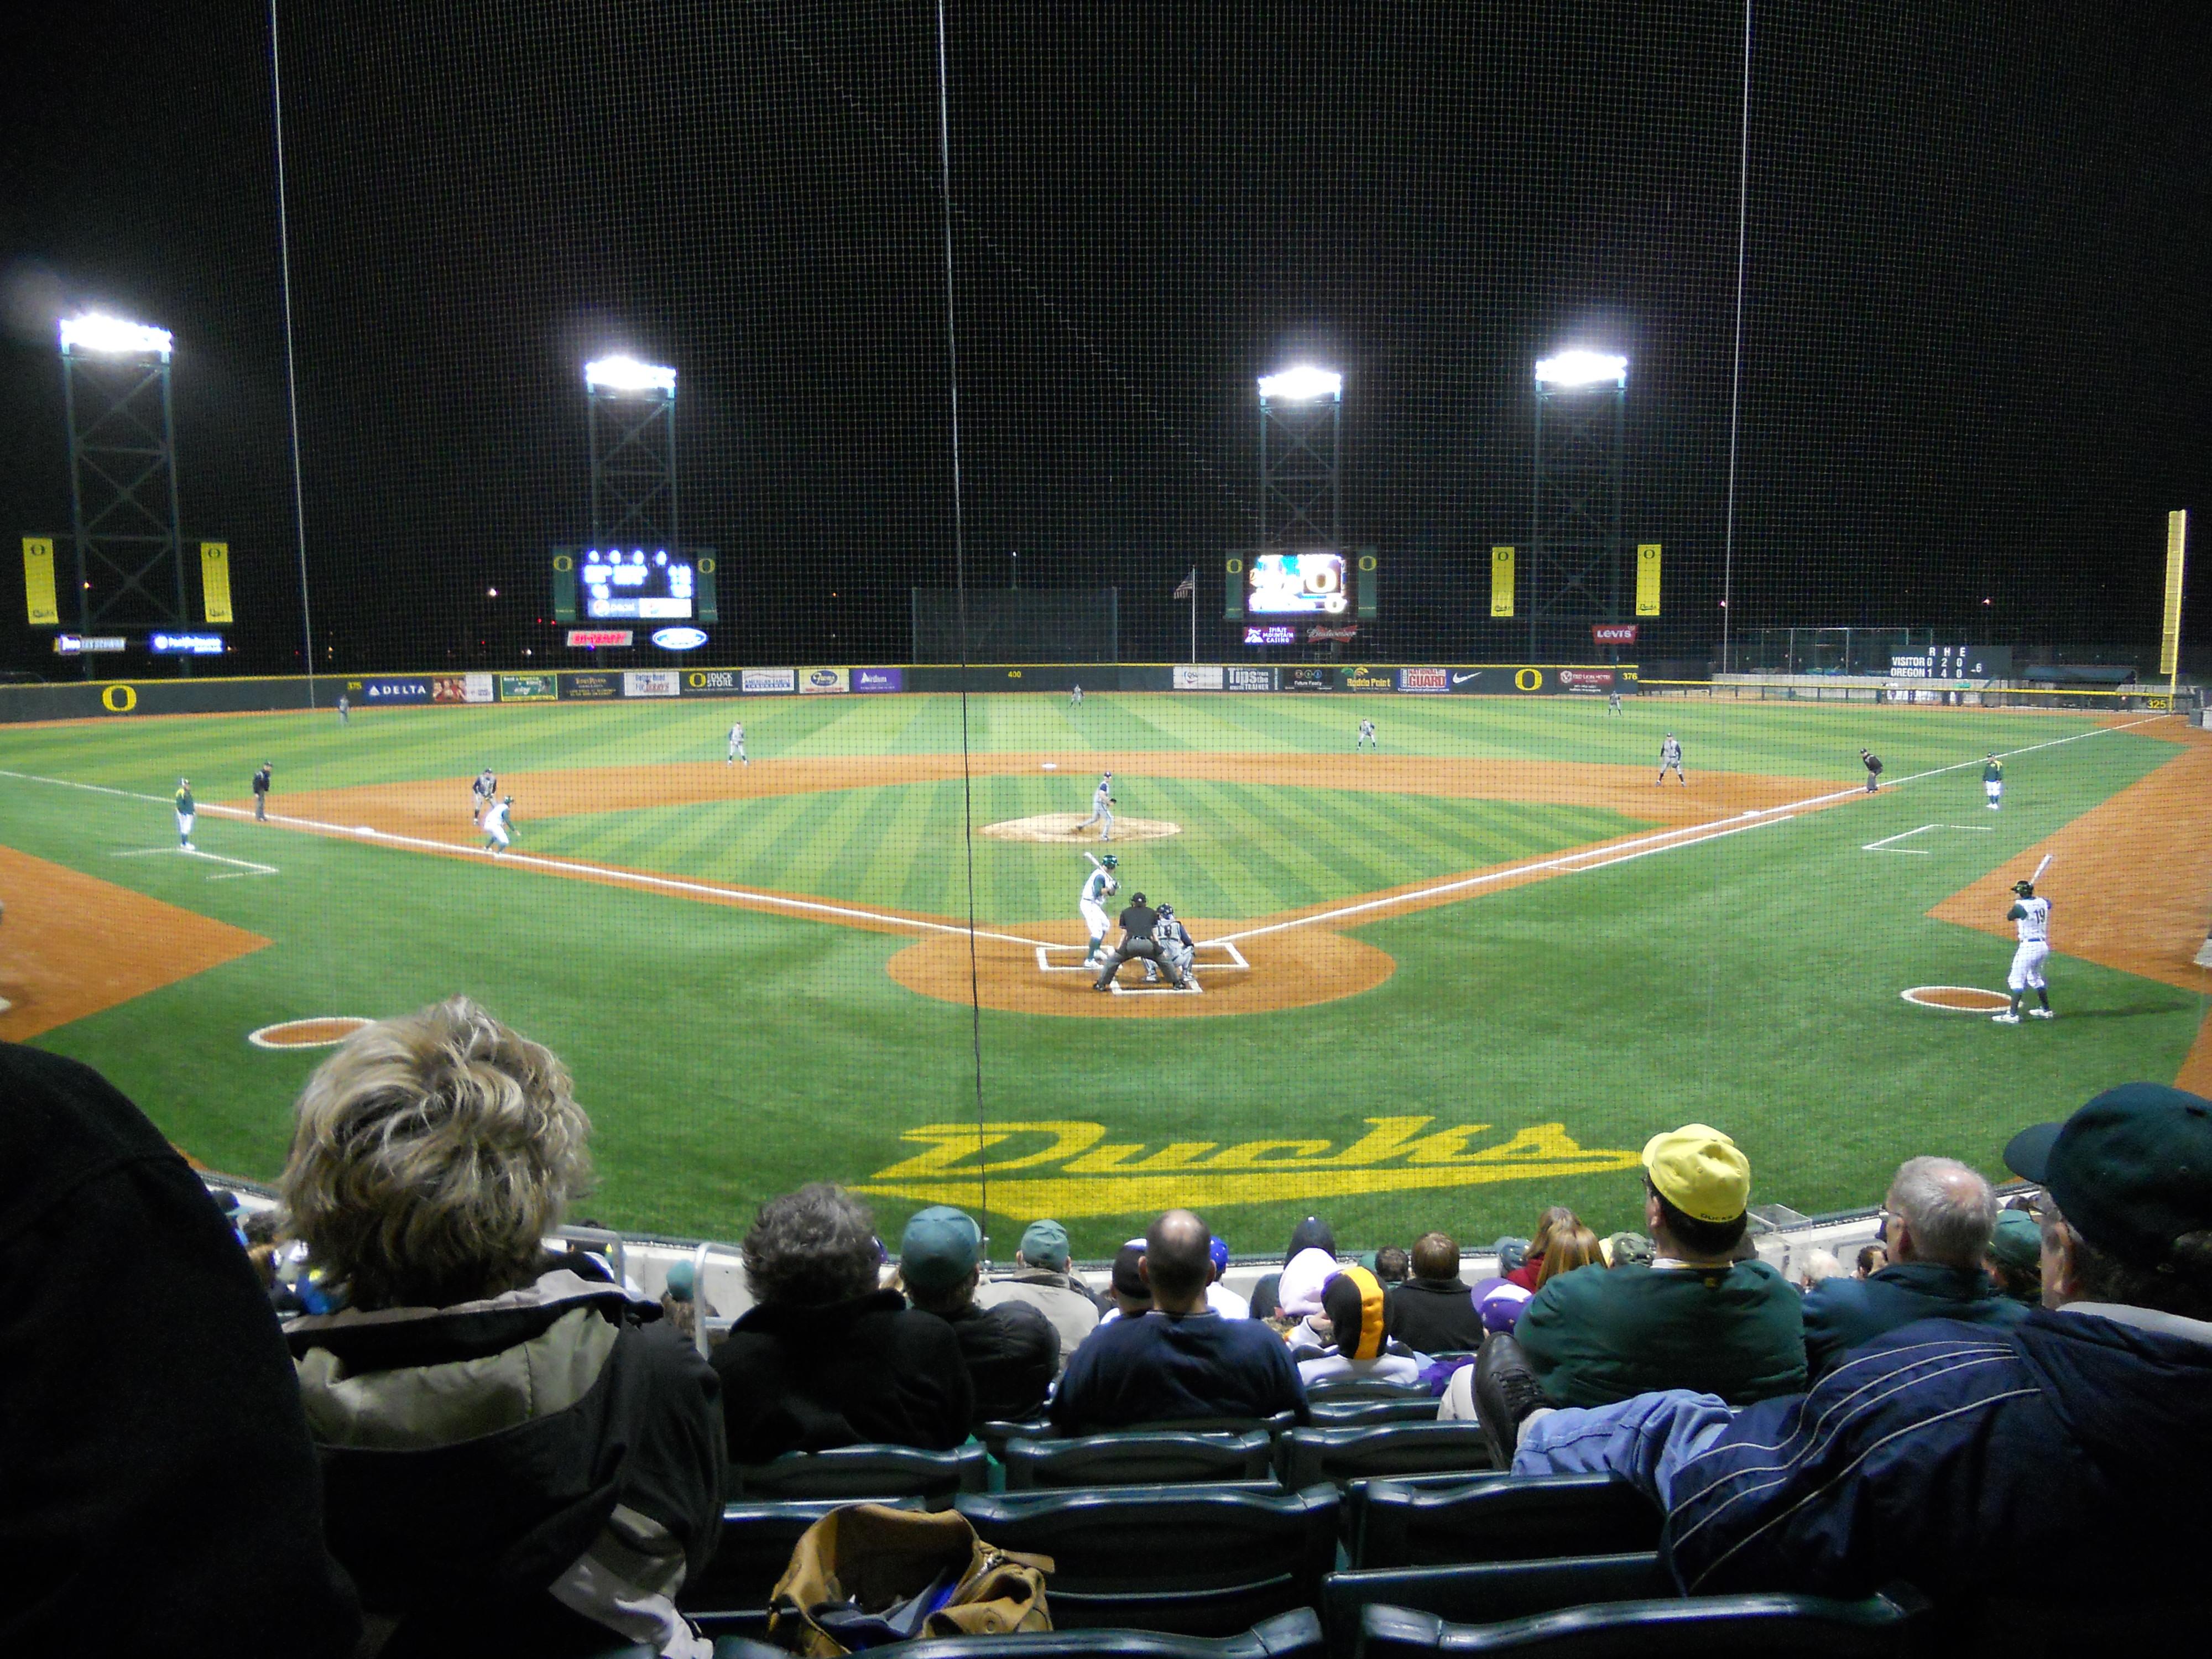 File:Oregon Ducks baseball game.JPG - Wikimedia Commons